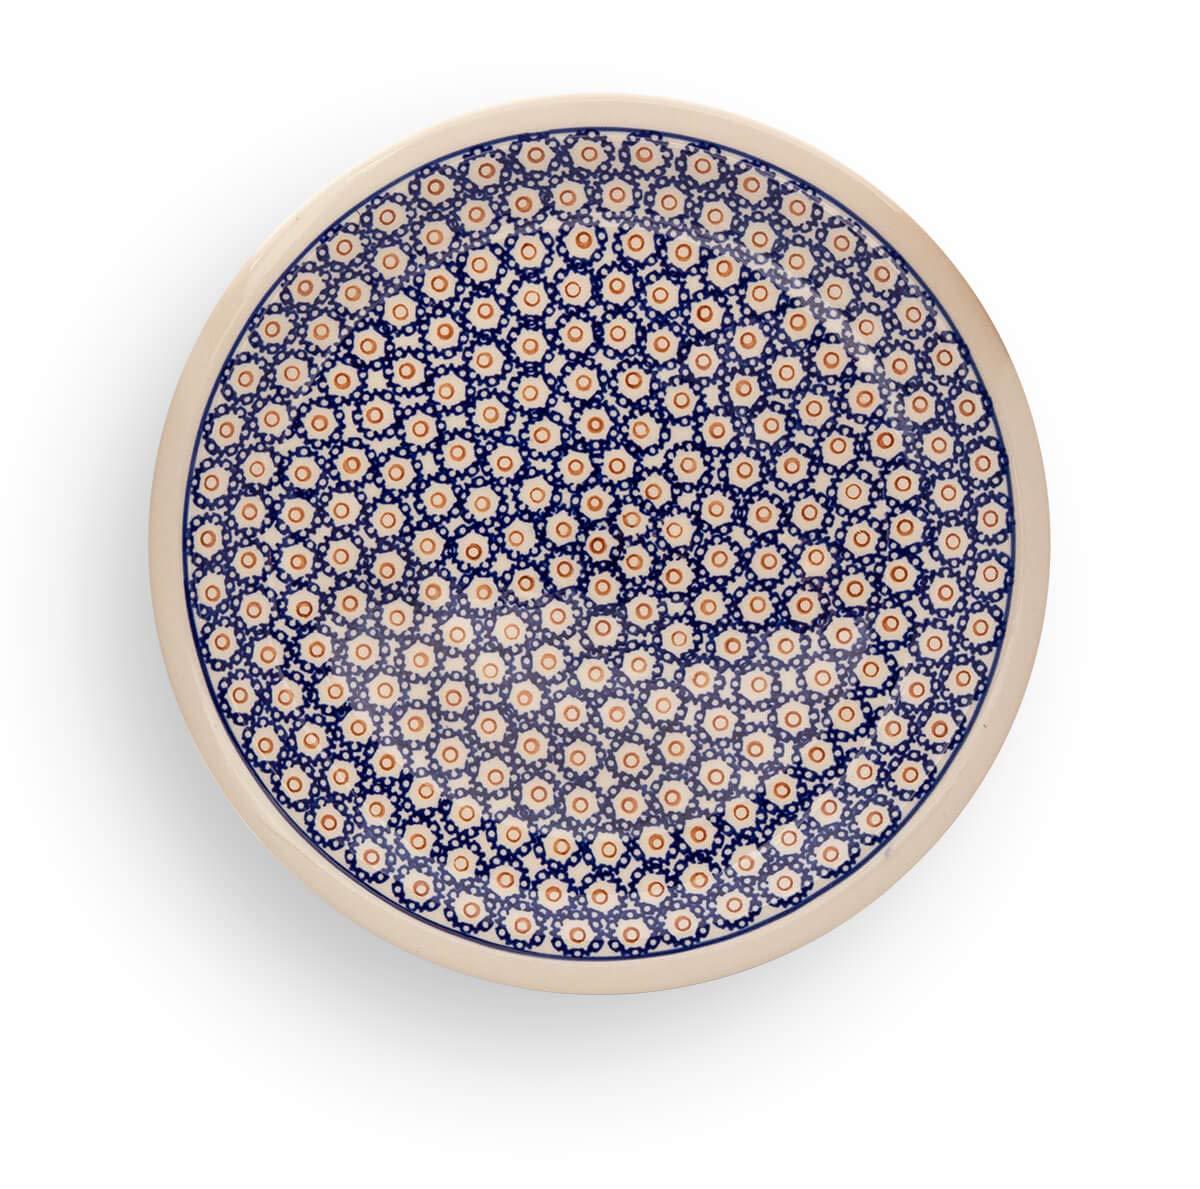 Polmedia Polish Pottery 11-inch Stoneware Plate H0220A Hand Painted from Zaklady Ceramiczne in Boleslawiec Poland. Shape S613A(GU1014) Pattern P2099A(4)